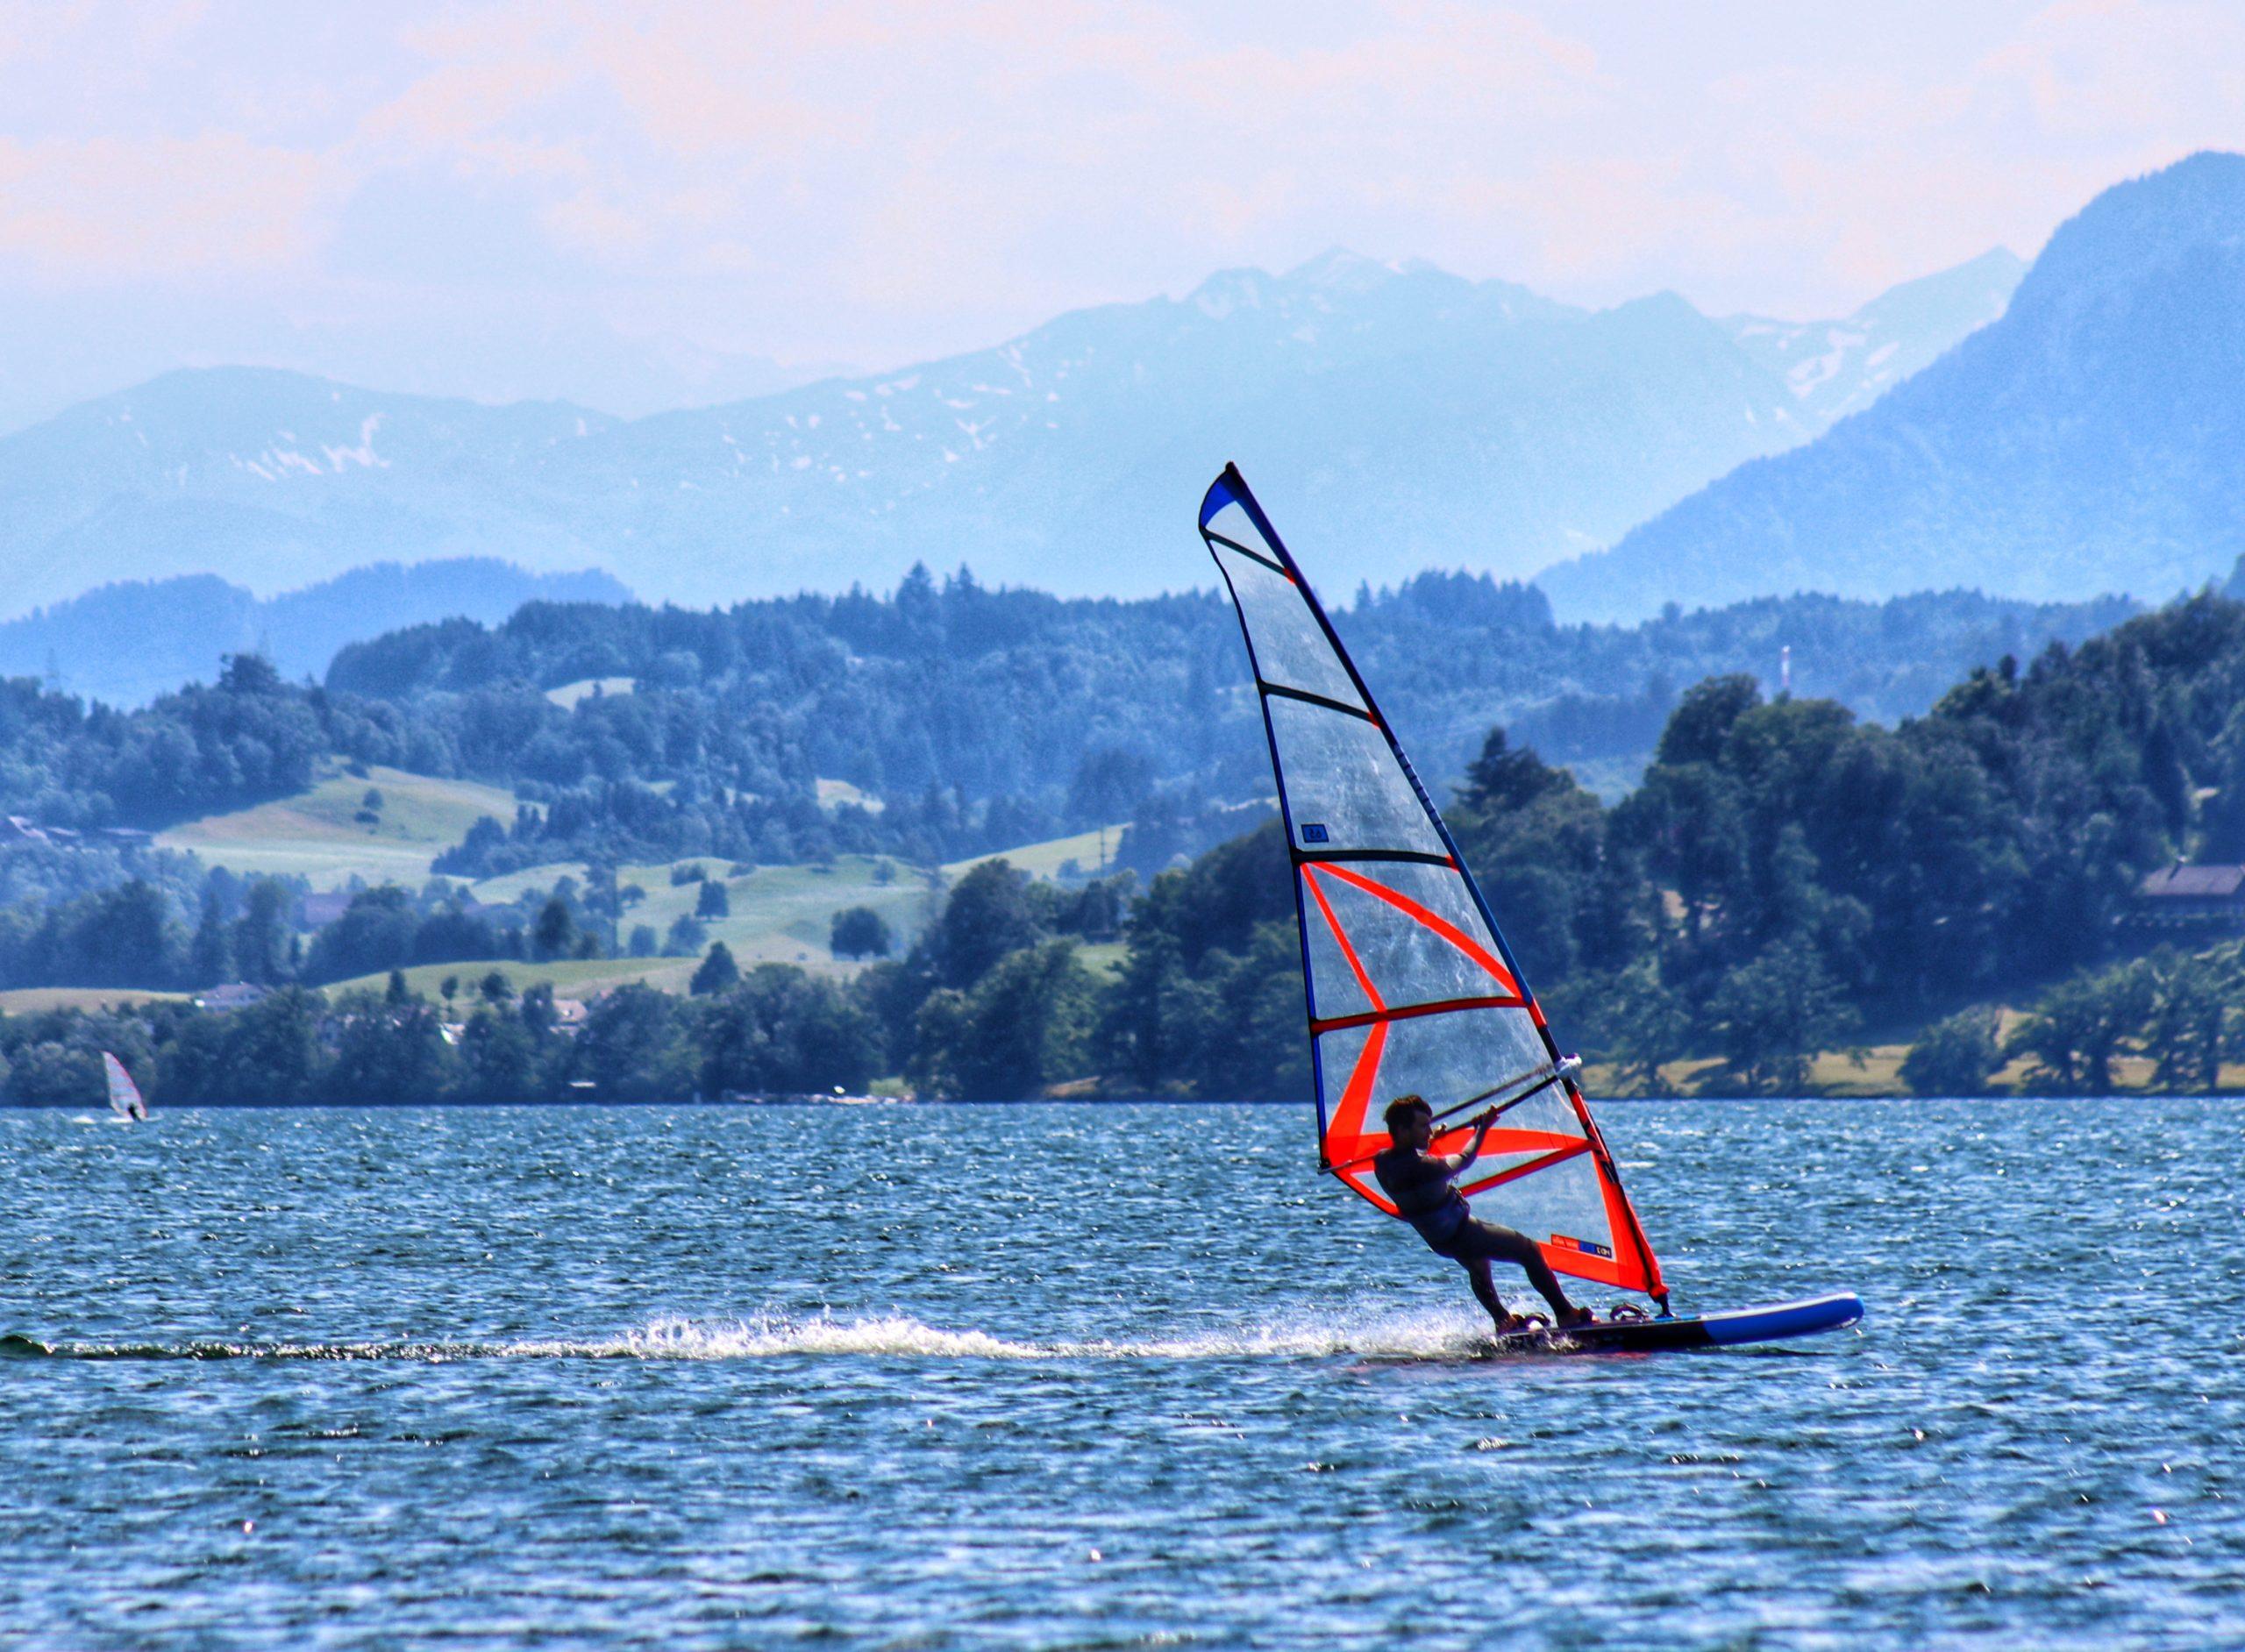 Windsurfing - Taster Session